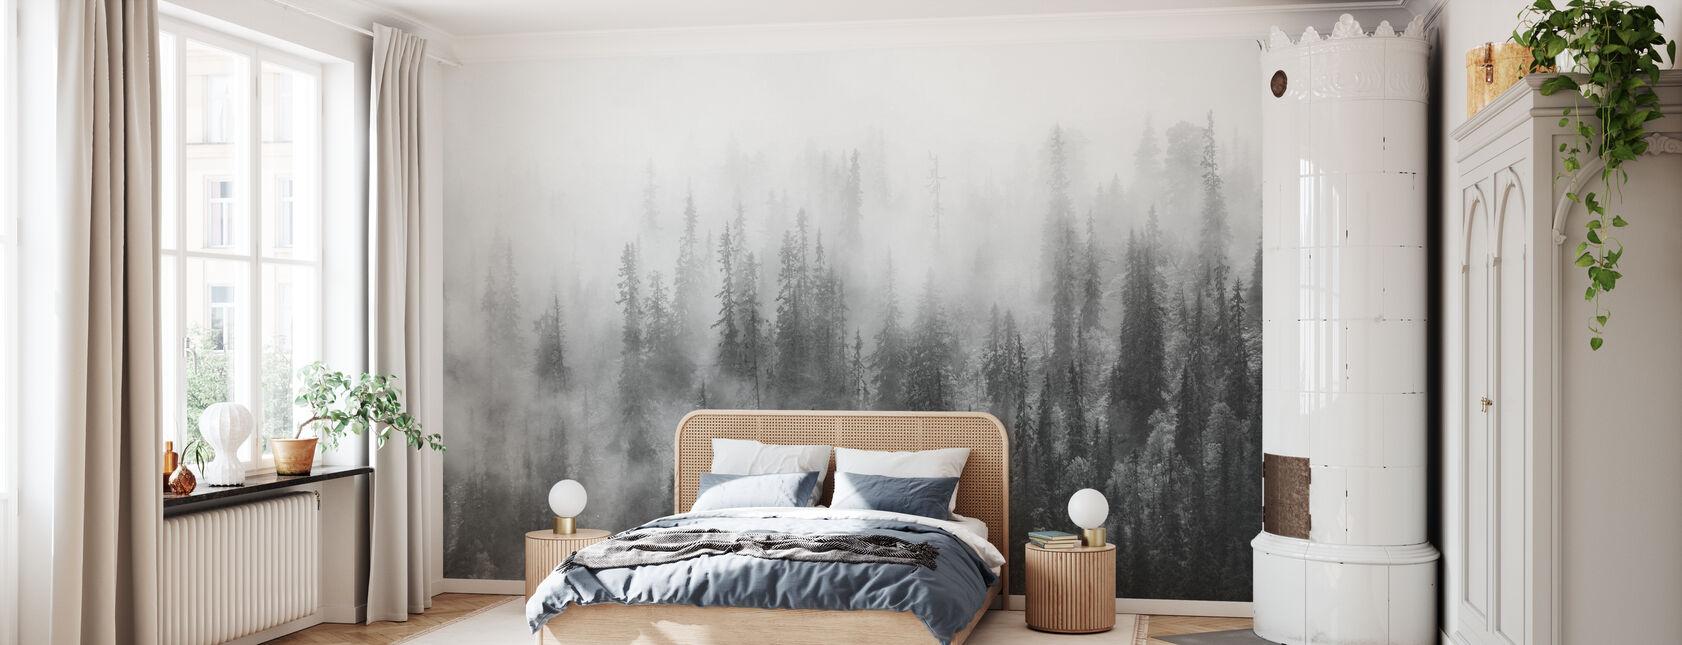 Skog i dimma - Tapet - Sovrum